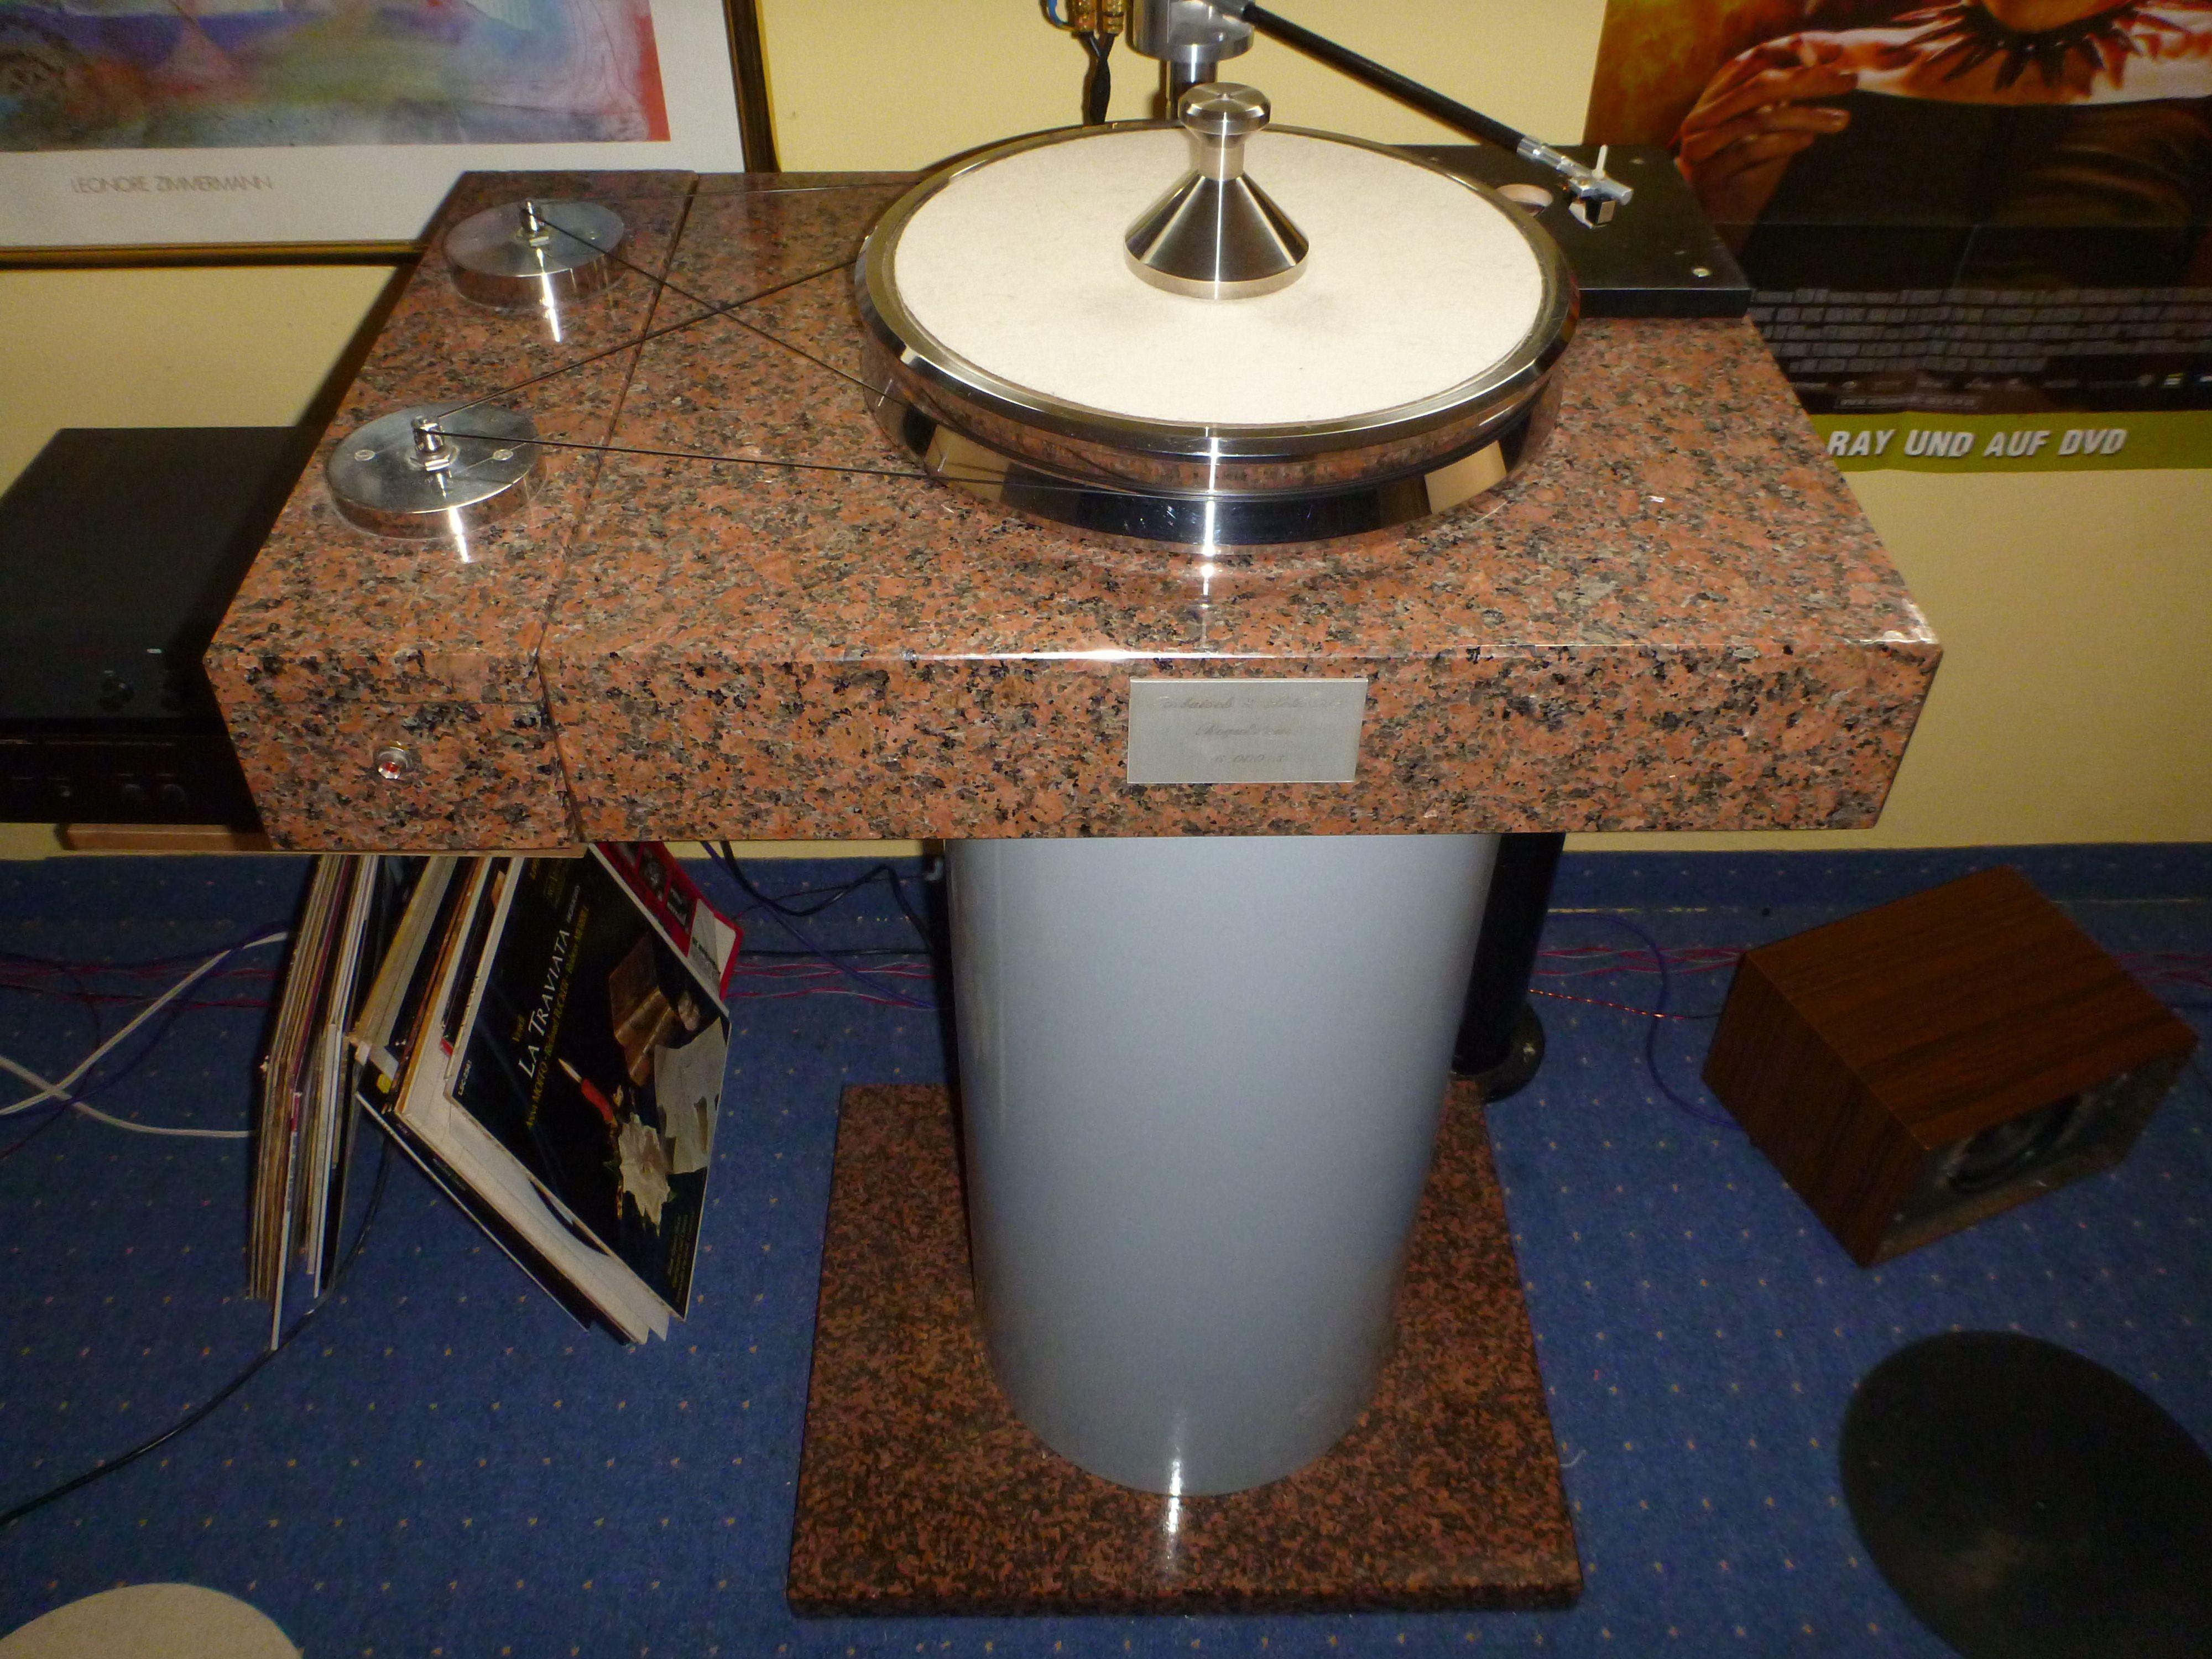 Granit Monster 50 Kg Teller Vinyl Jewelry Audiophile Turntable